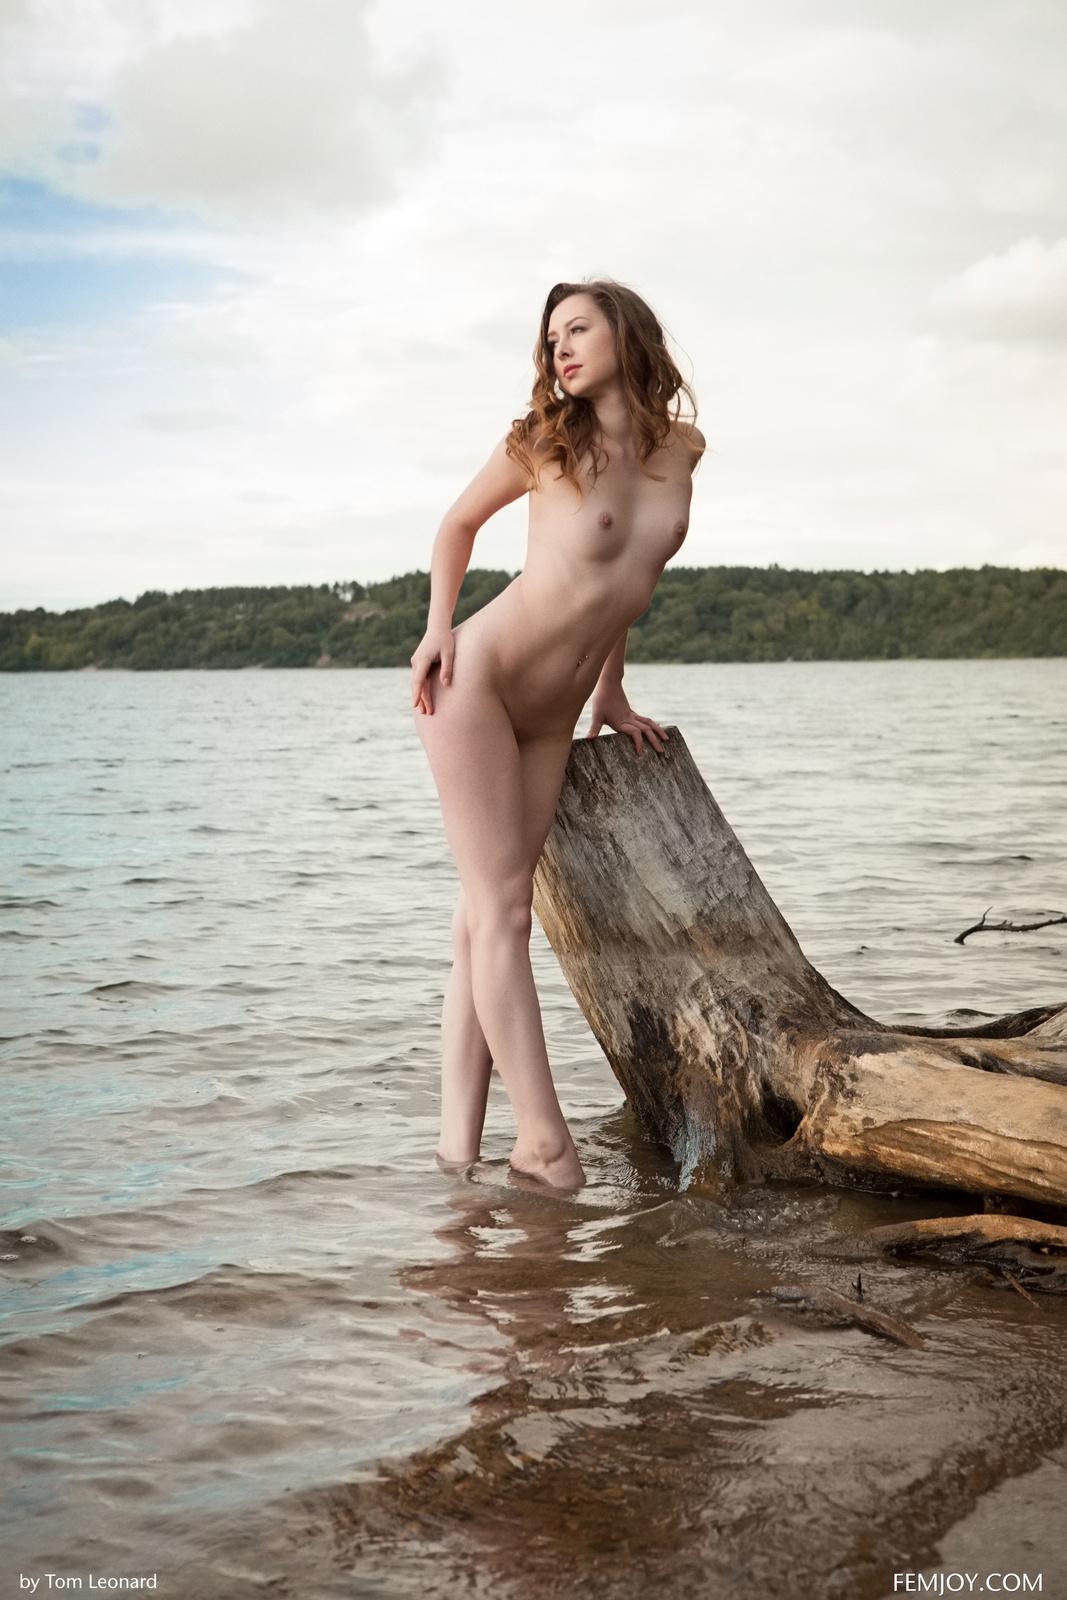 Zdjęcie porno - 084 - Zgrabna i naga laska nad jeziorkiem